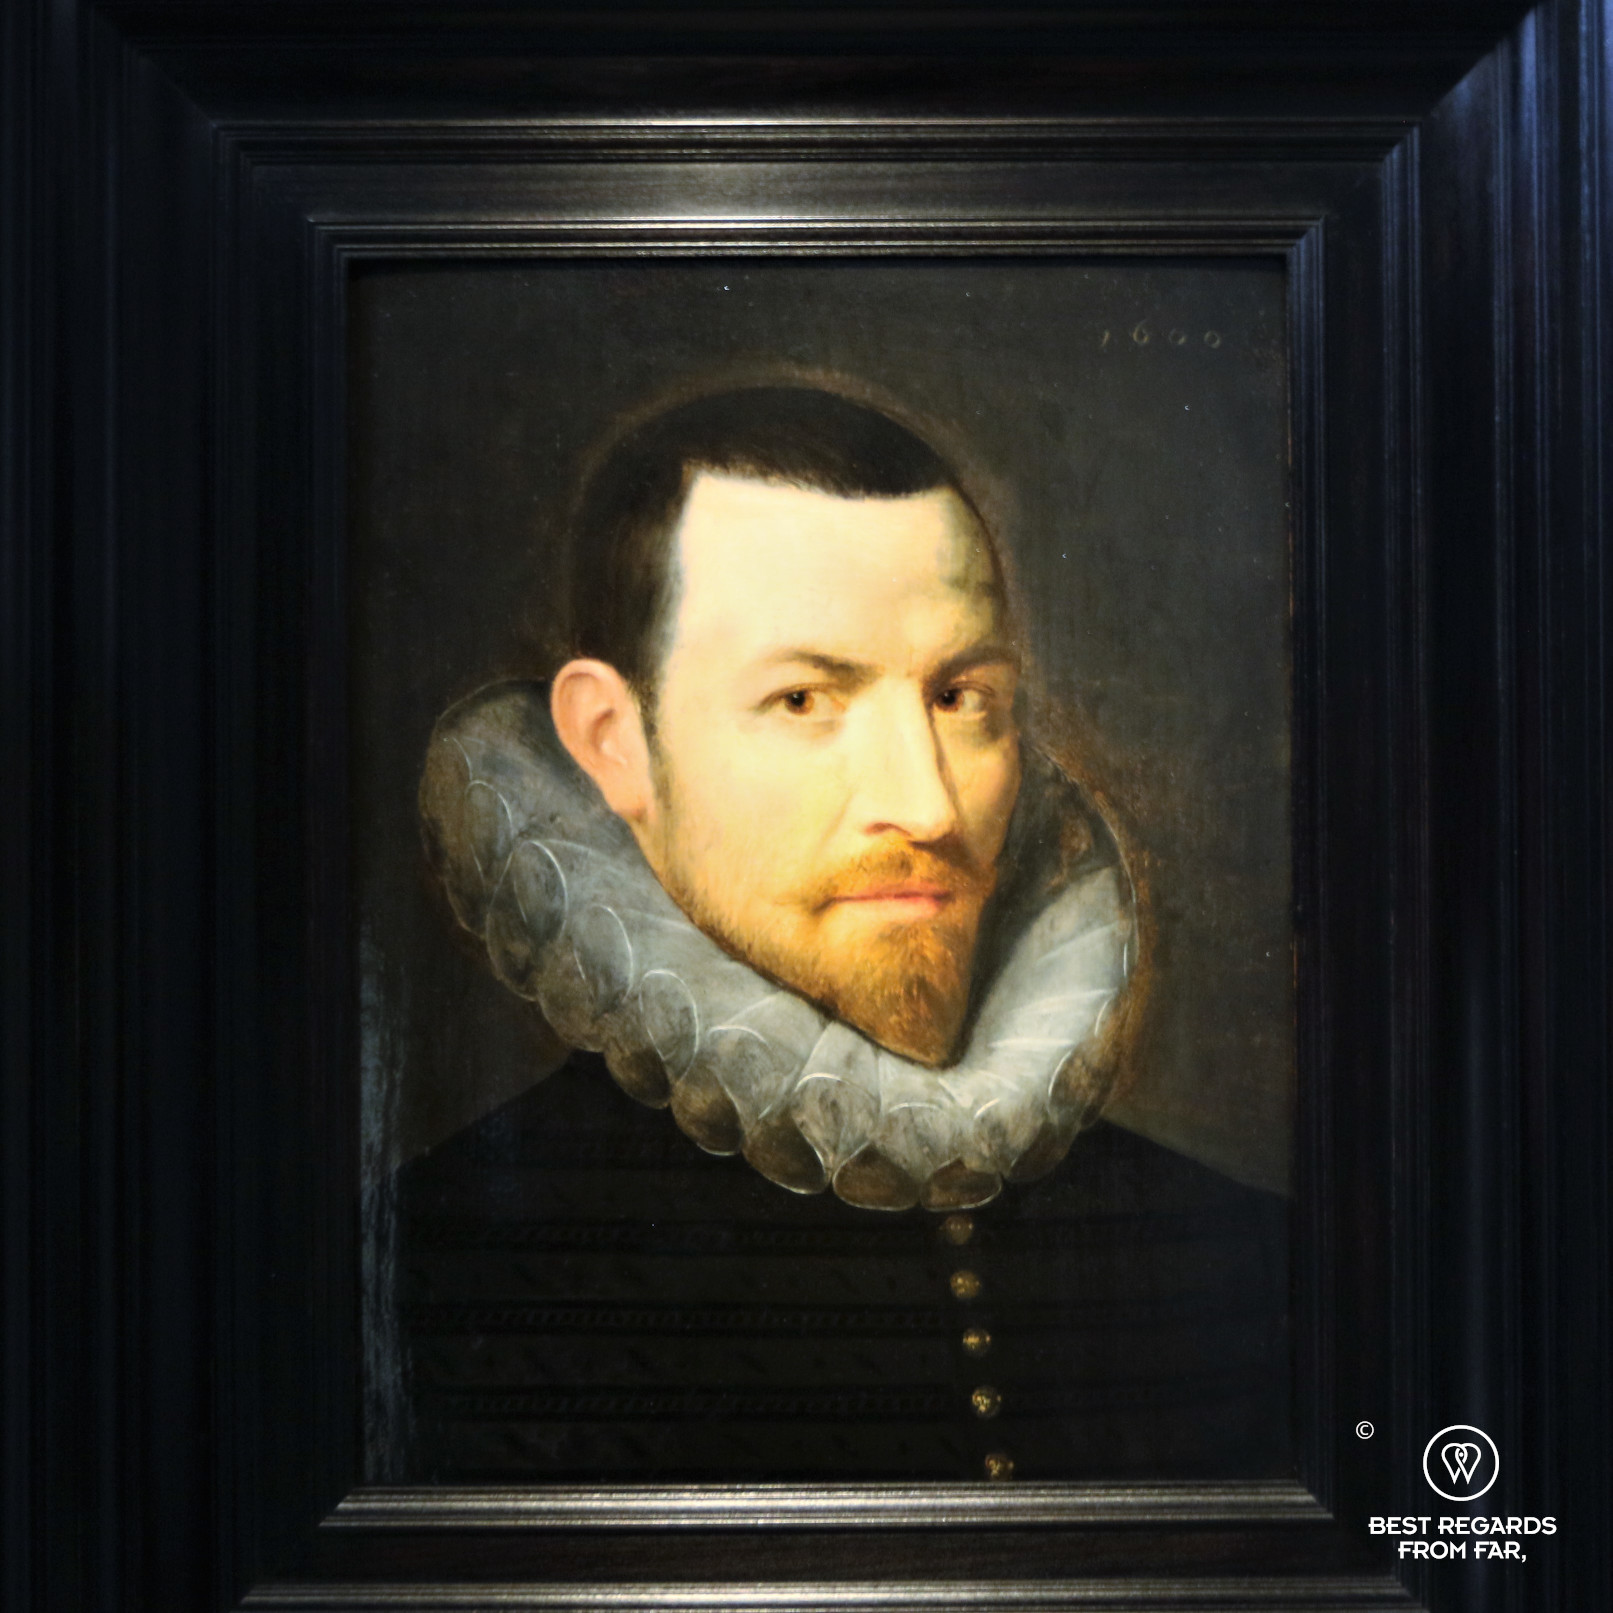 Nicolas Rockox (1600) by Rubens' master Otto van Veen, Rubens' House, Antwerp